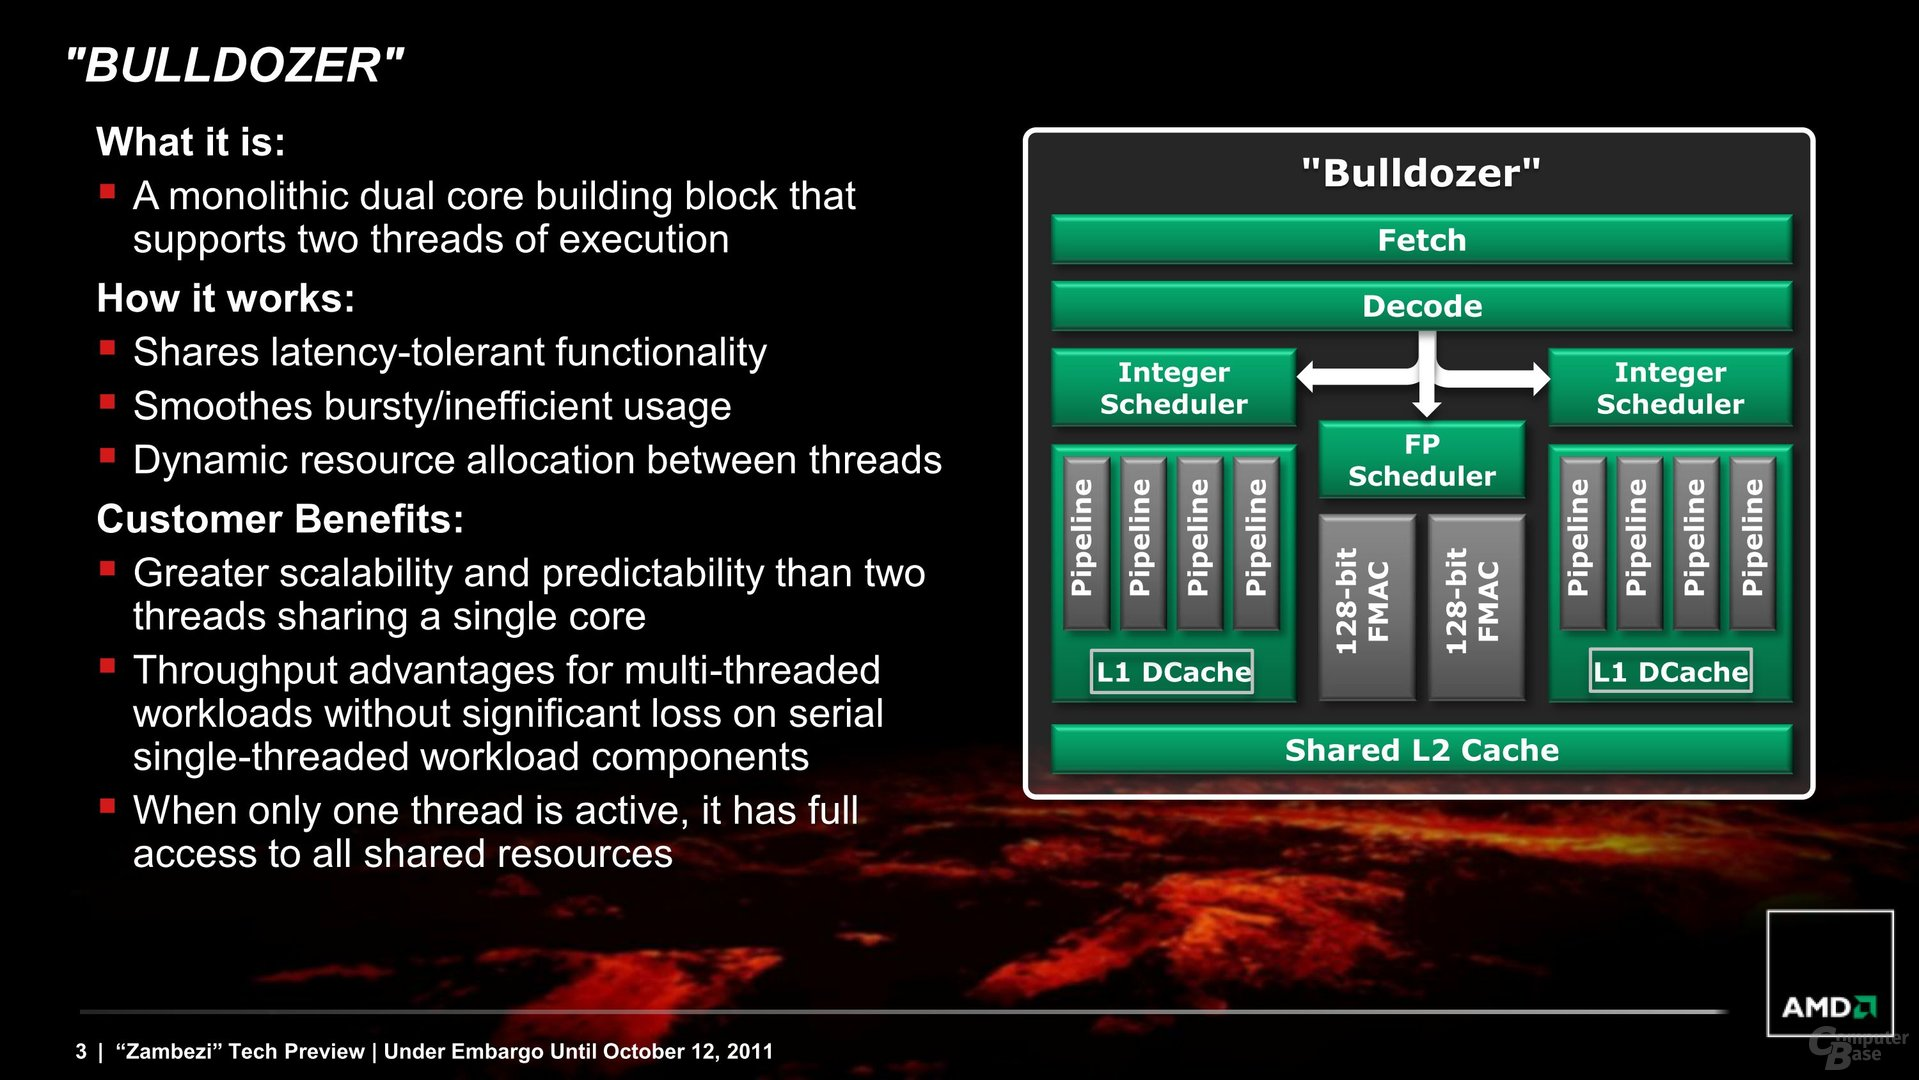 Bulldozer-Architektur